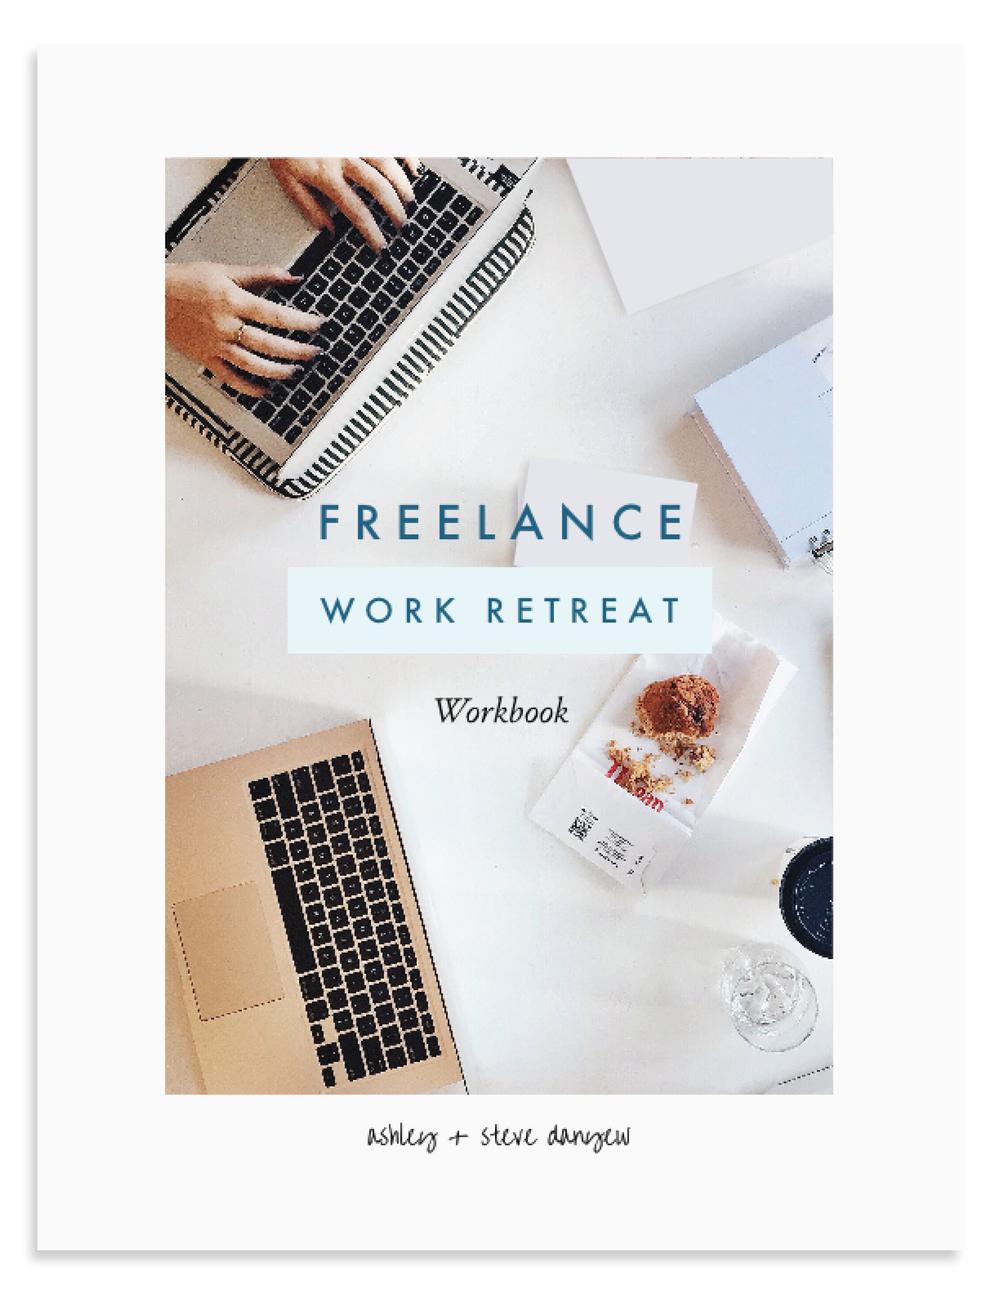 Freelance Work Retreat Workbook - Ashley and Steve Danyew.png